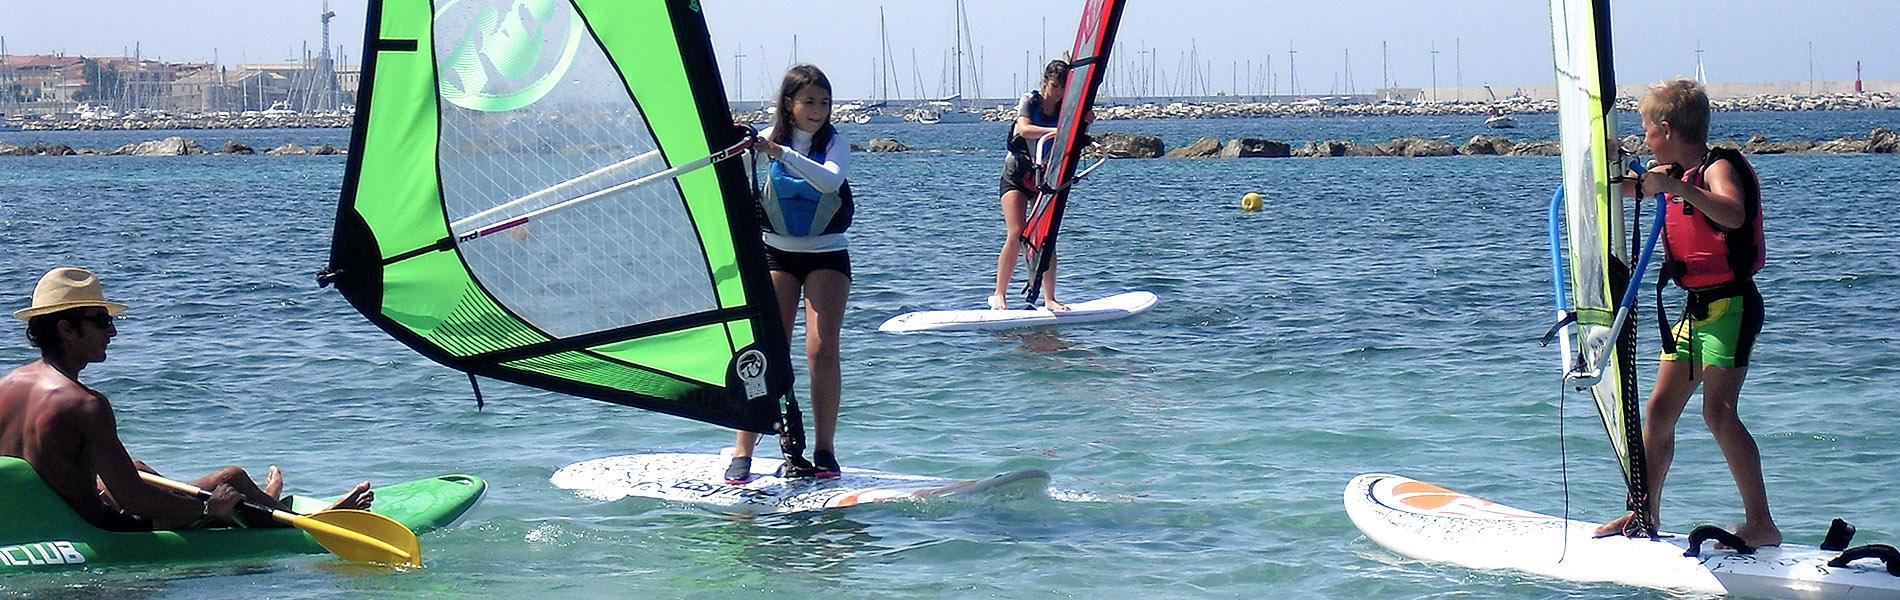 Nauticlub corso windsurf 01